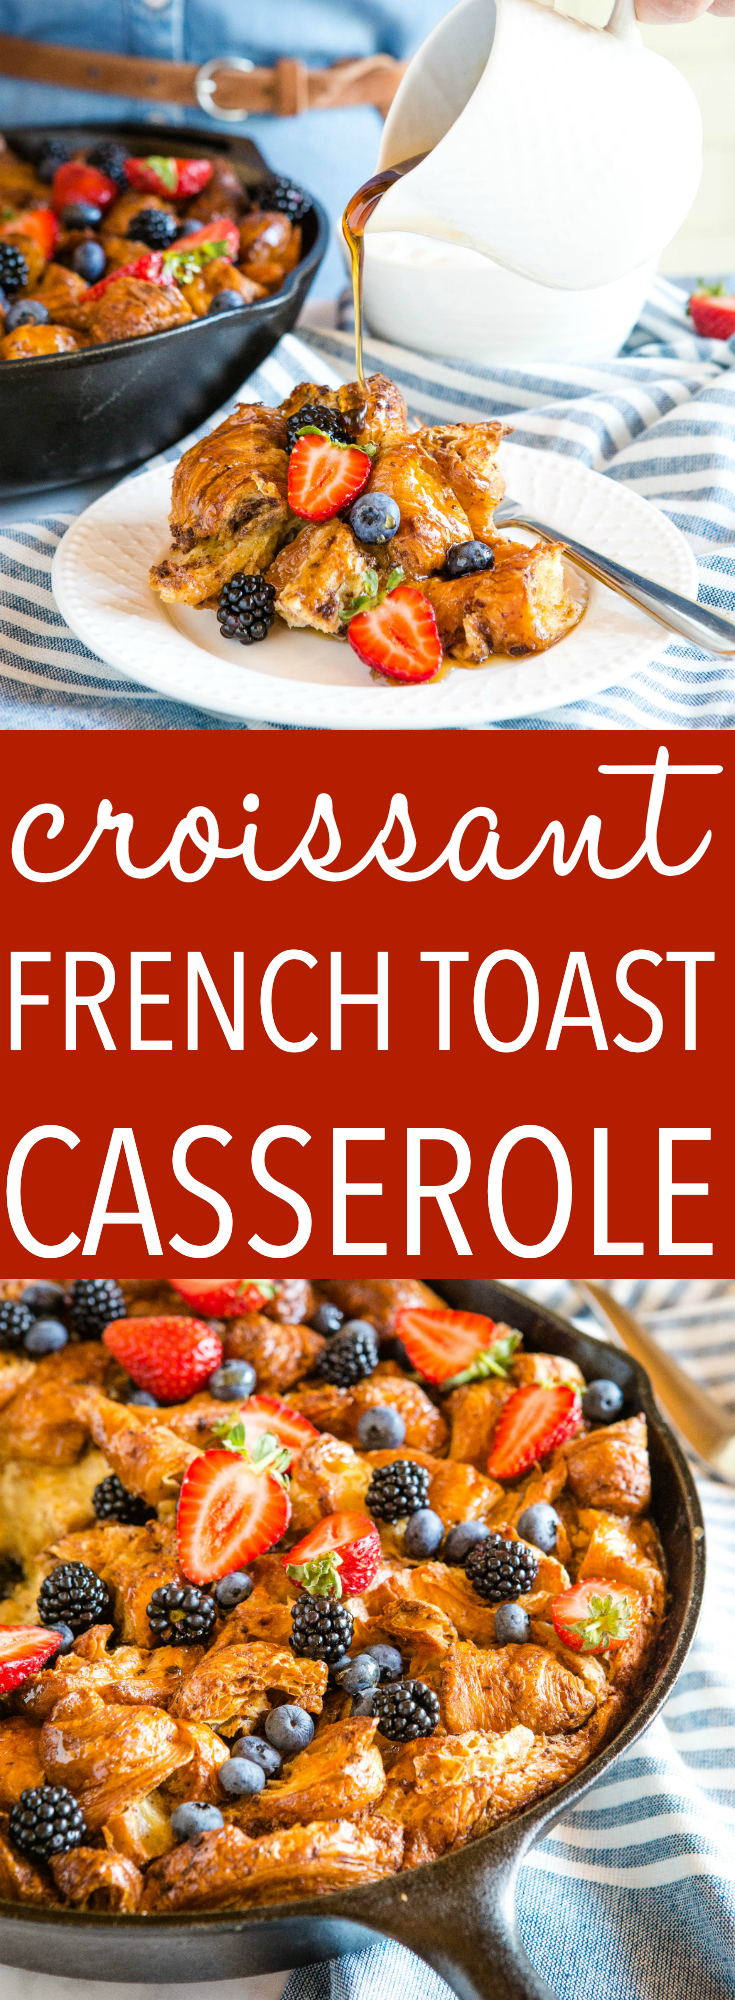 Skillet Croissant French Toast Casserole Pinterest